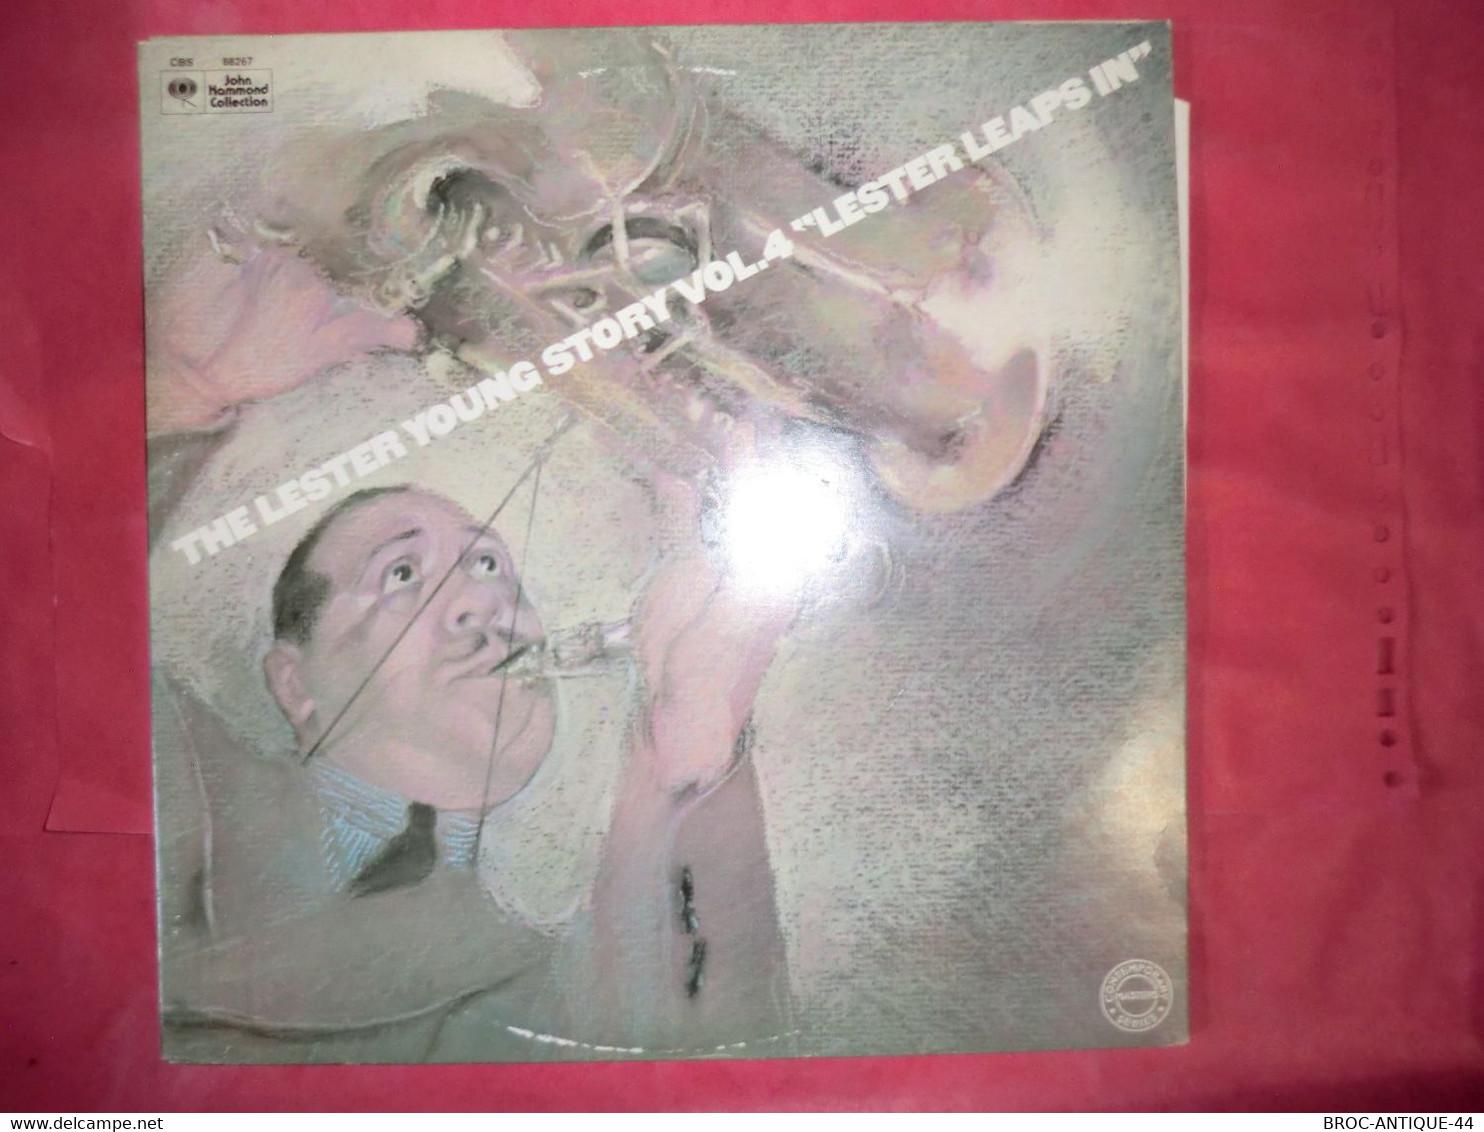 LP33 N°8244 - LESTER YOUNG - 2 LP'S - MONO 88266 - Jazz